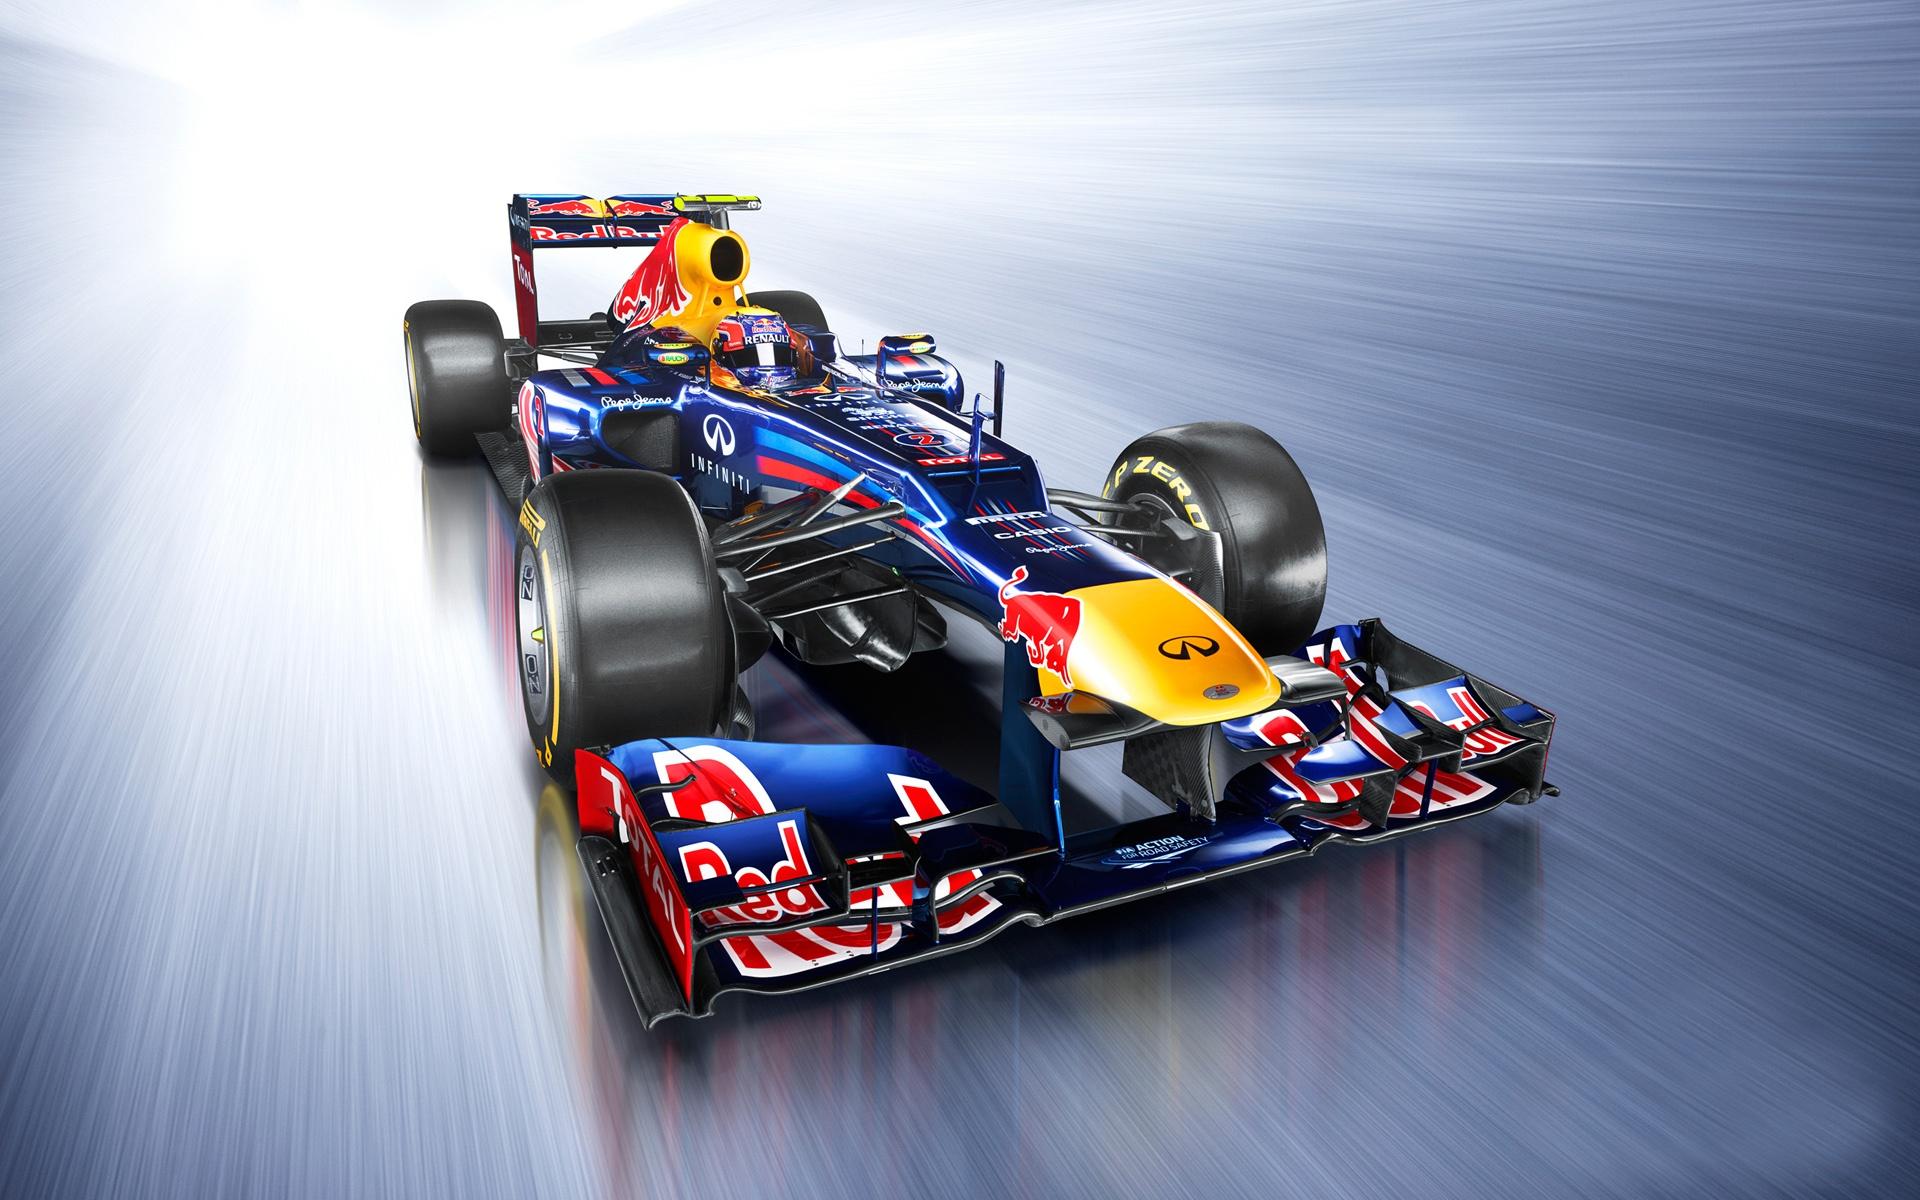 Formel 1 - Formel 1 bilder